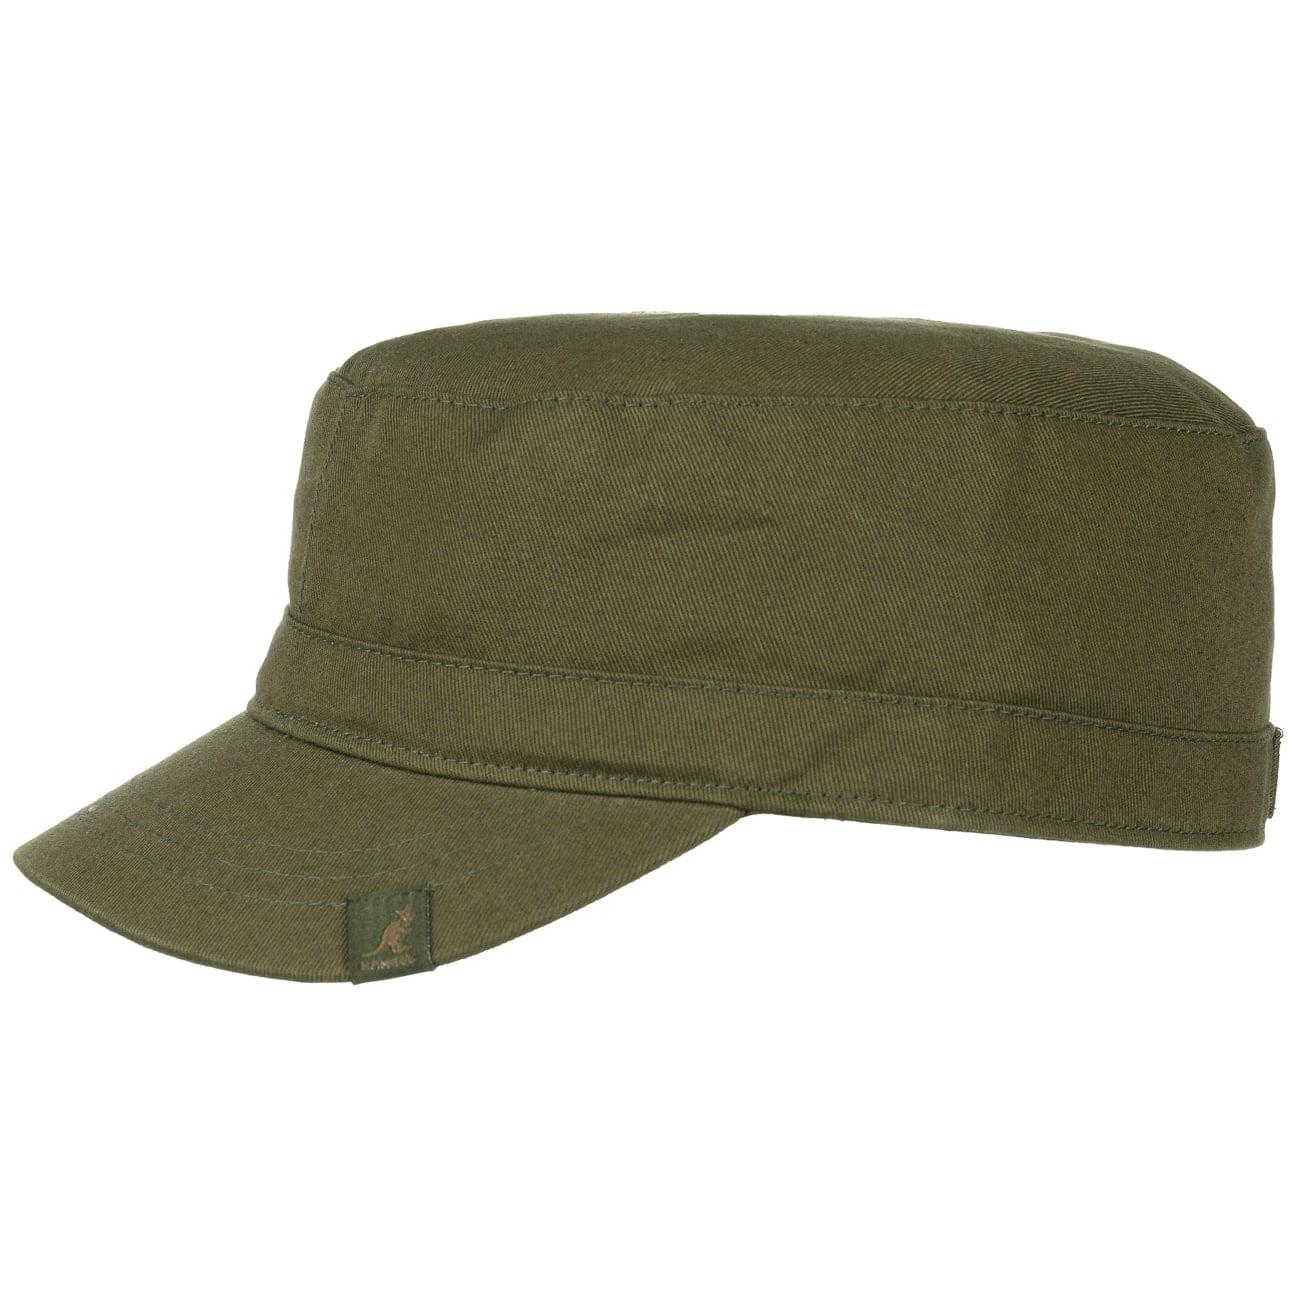 ... Kangol Cotton Army Cap - olive 5 ... d016e5342dc